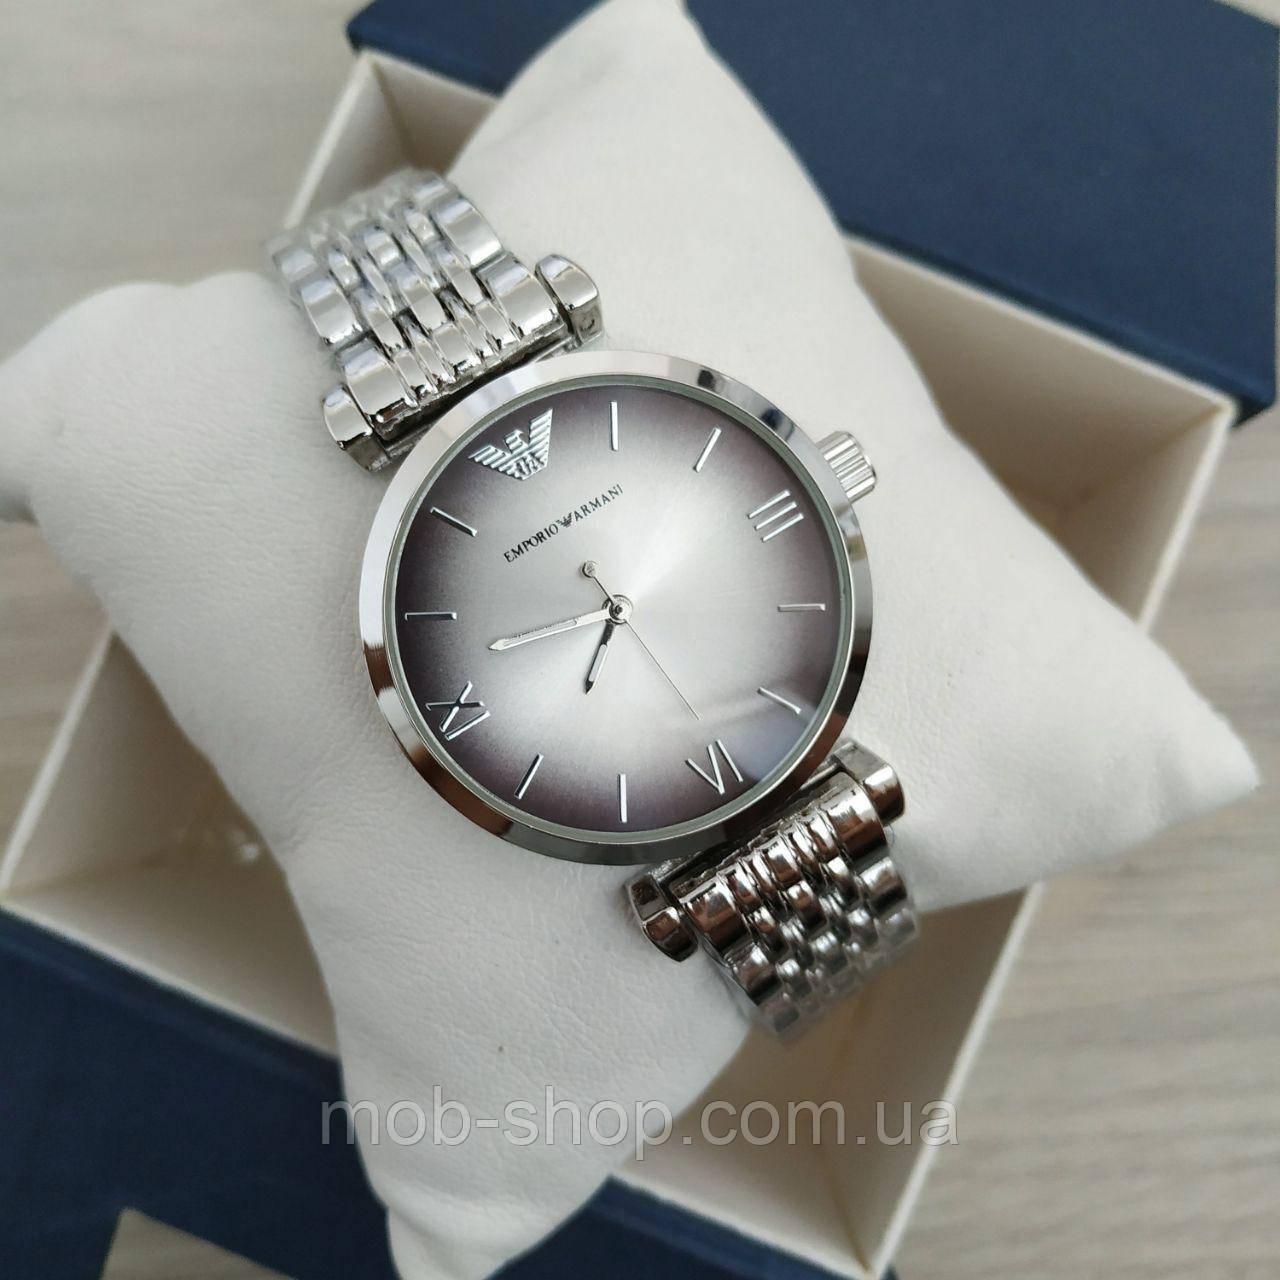 Наручные часы Emporio Armani 6721